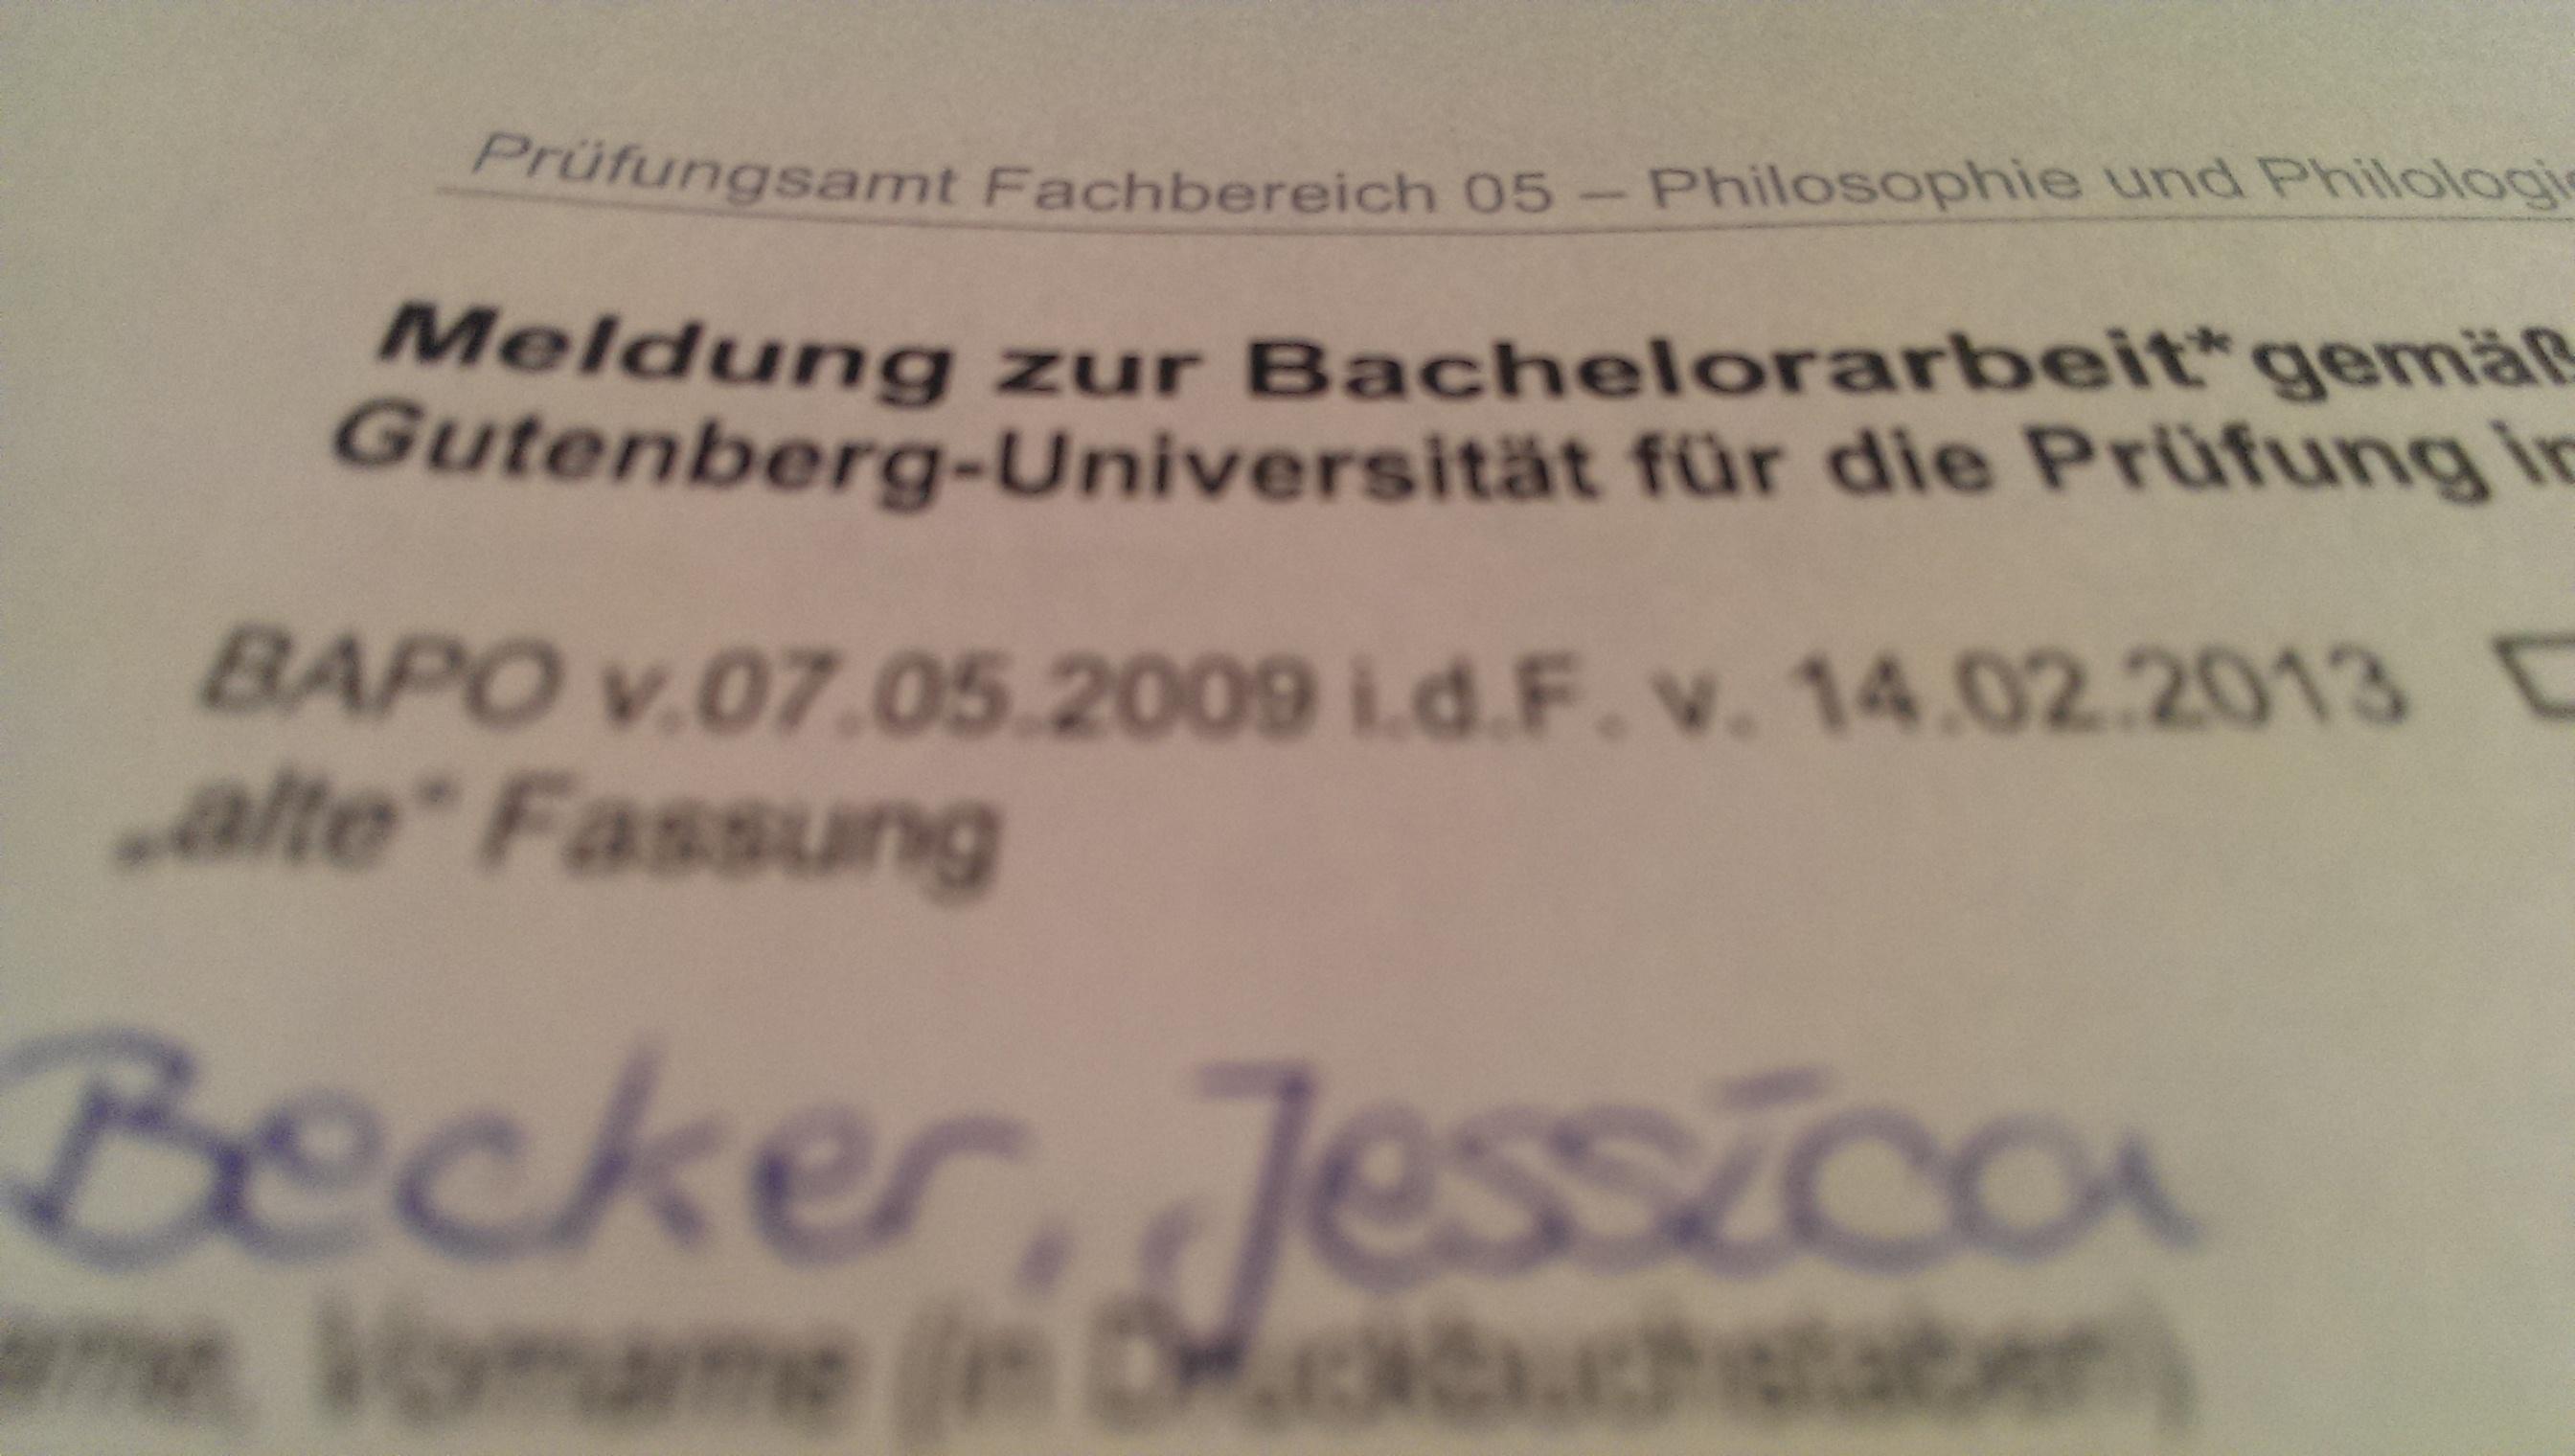 [Projekt Bachelorarbeit] Es ist offiziell